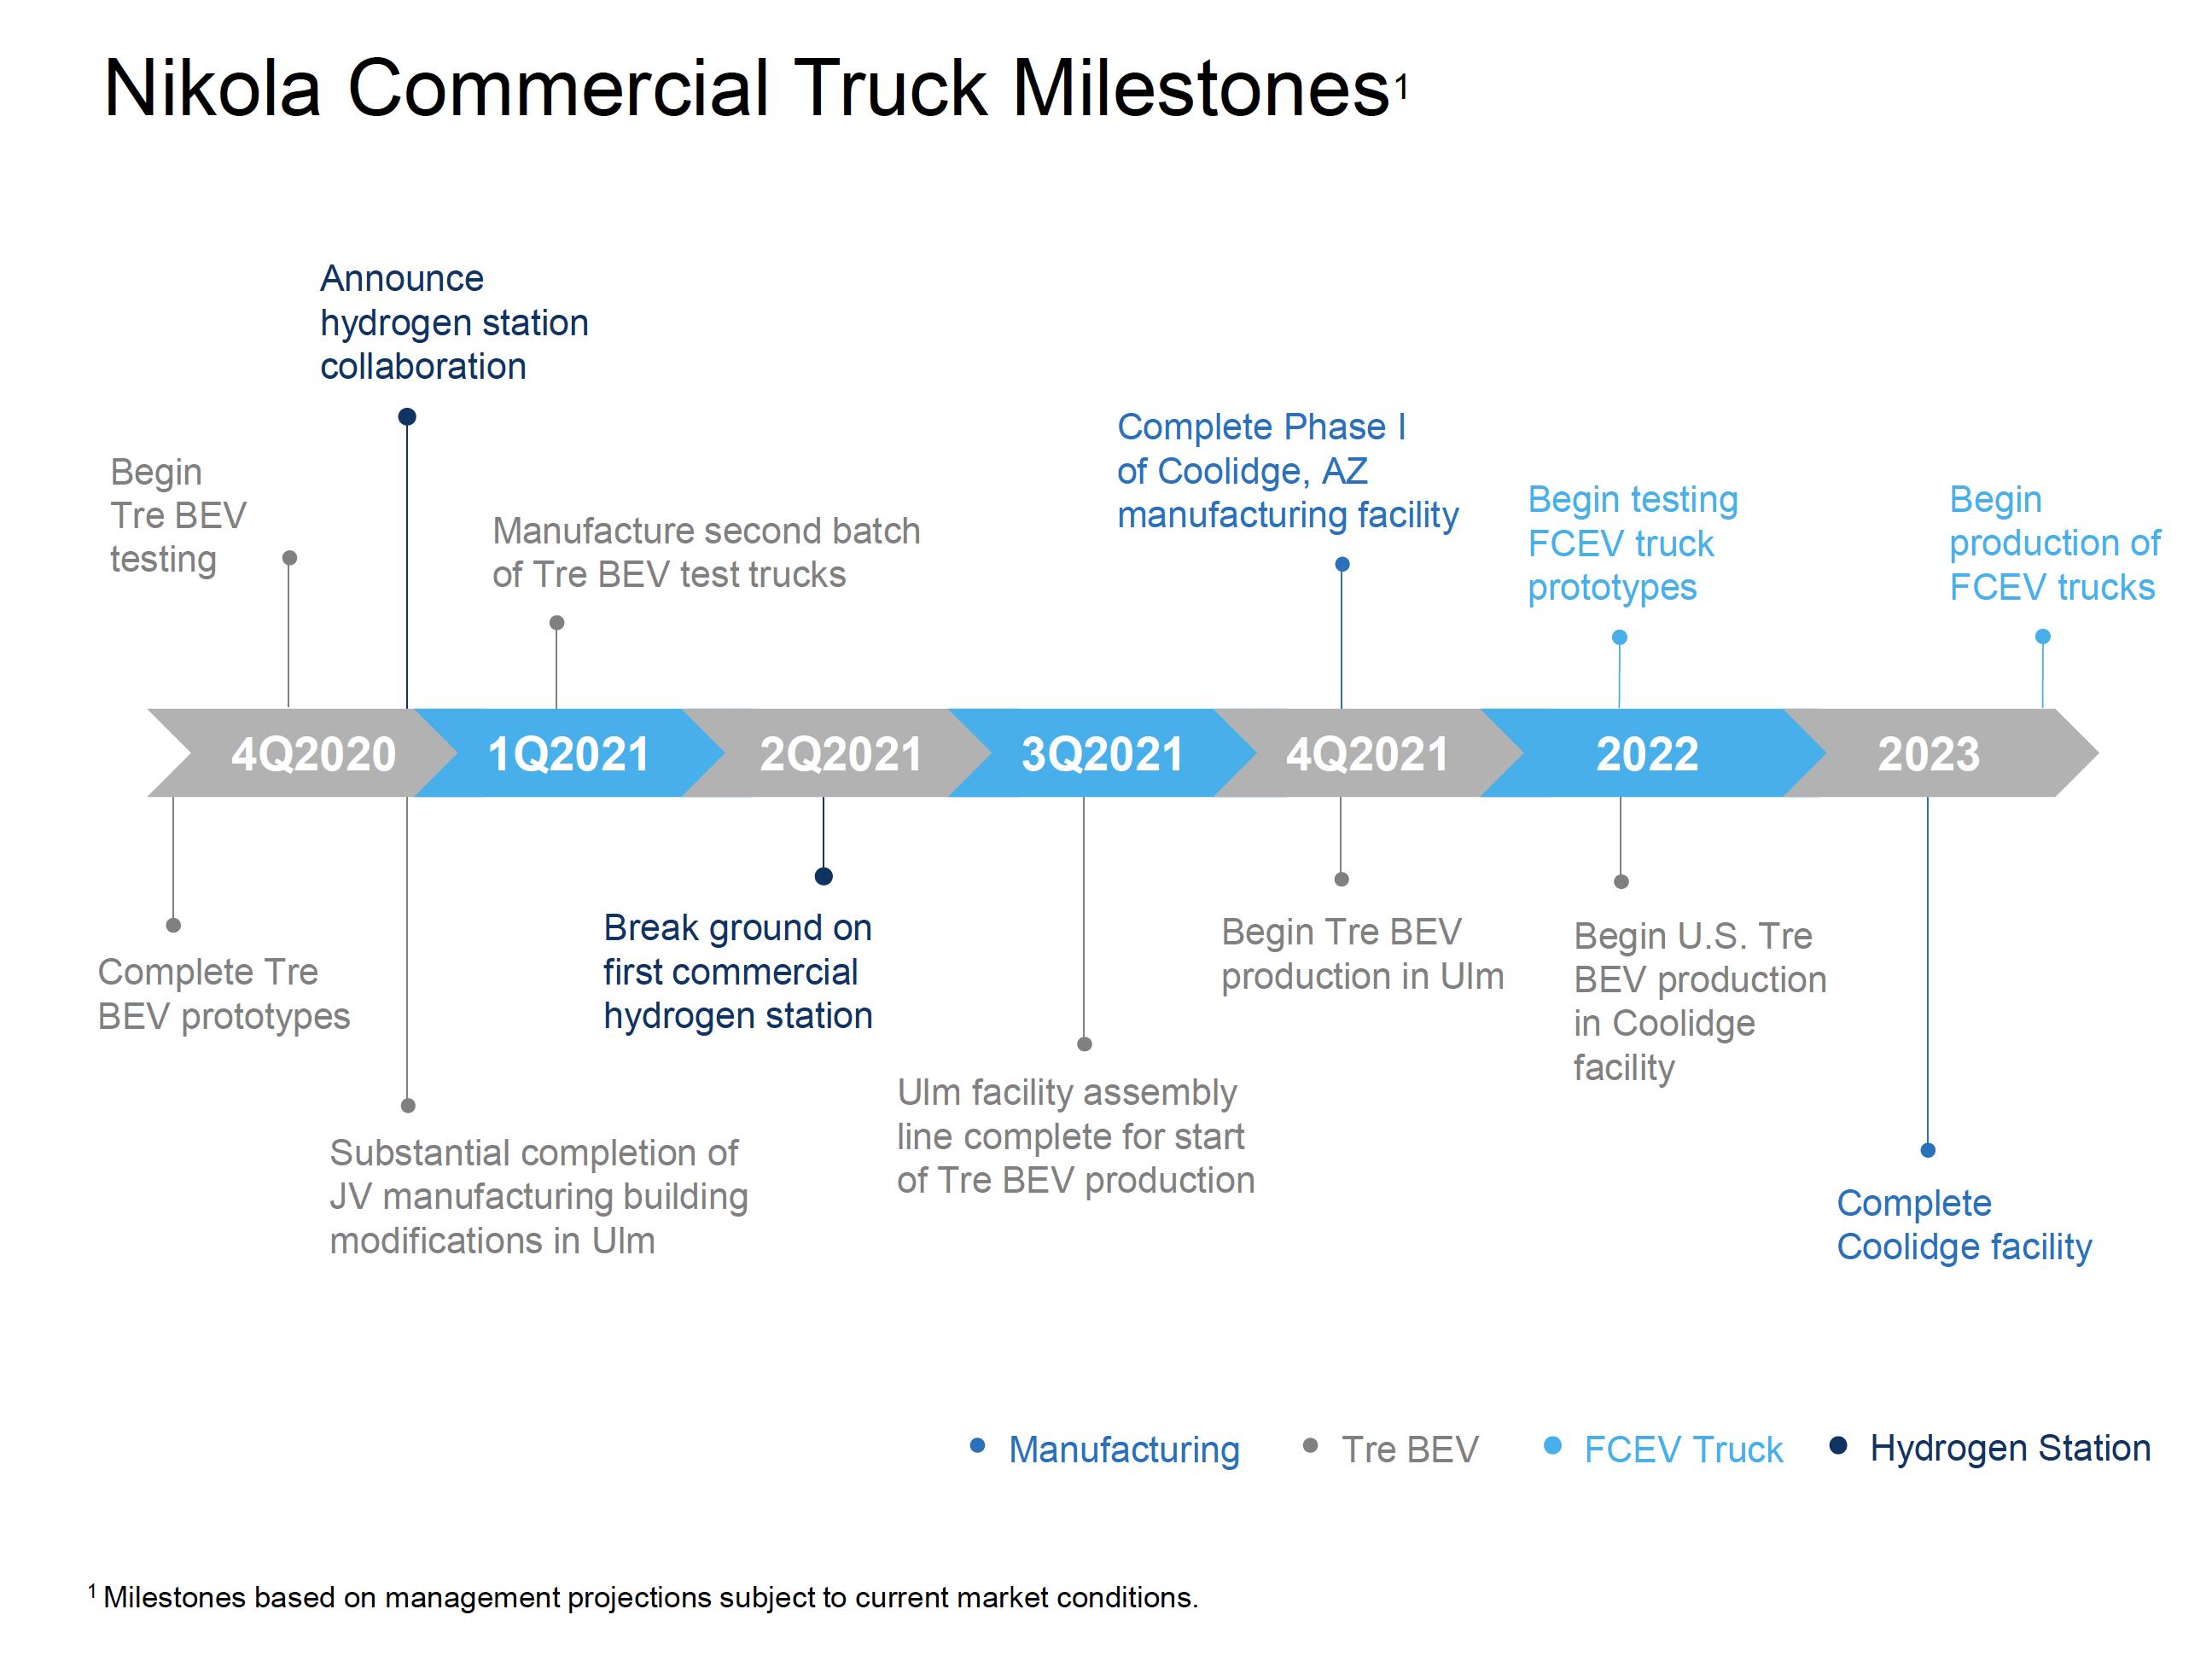 NKLA Commercial Truck Milestones2